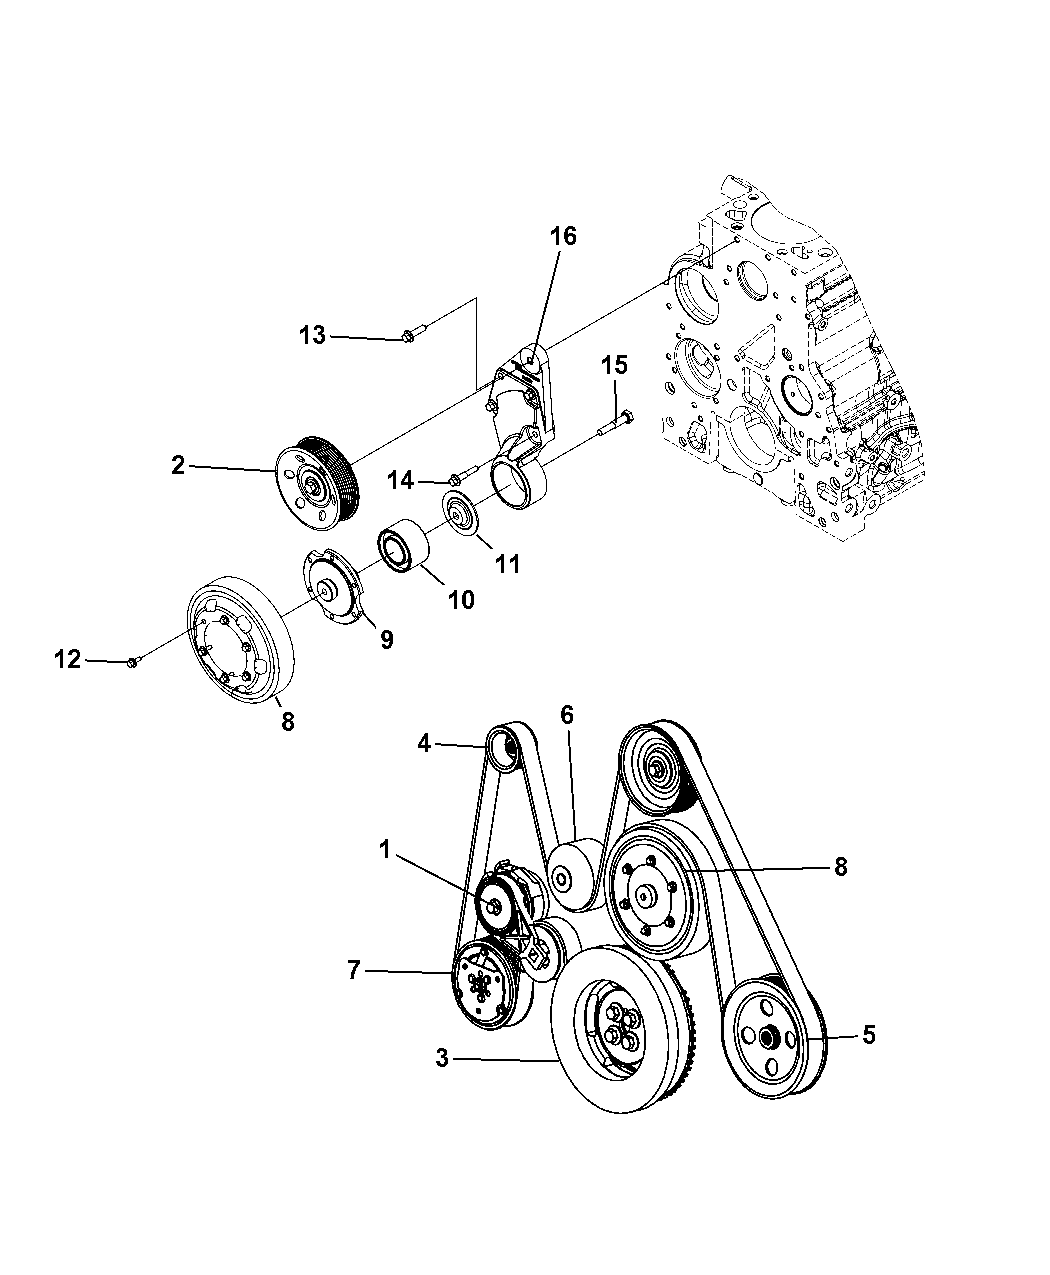 5183490AA - Genuine Mopar PKG-ALTERNATOR